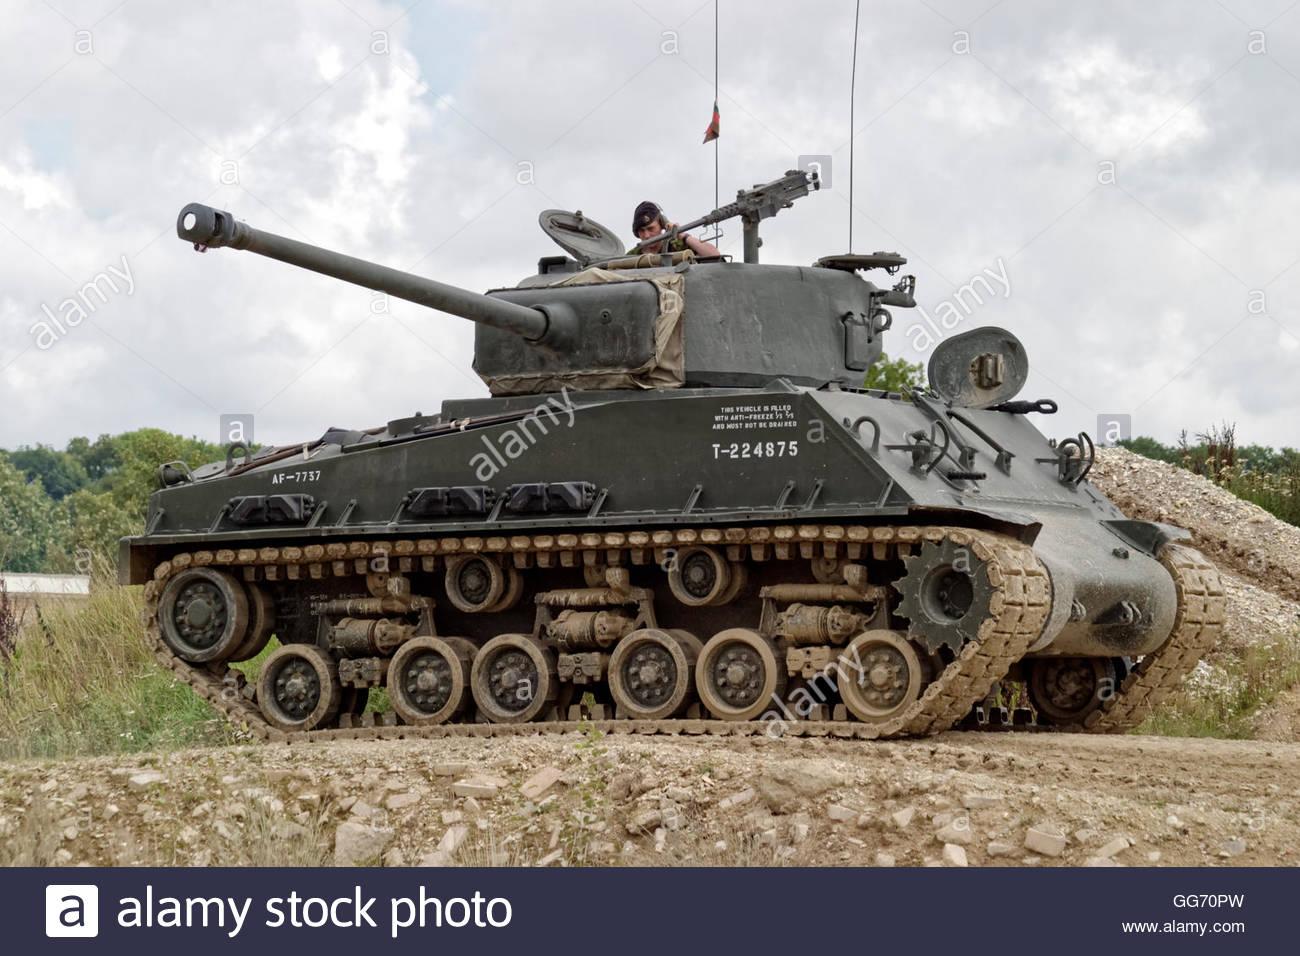 Click image for larger version  Name:an-m4a2-76-hvss-sherman-tank-at-the-tank-museum-bovington-dorset-united-GG70PW.jpg Views:66 Size:177.4 KB ID:2254712